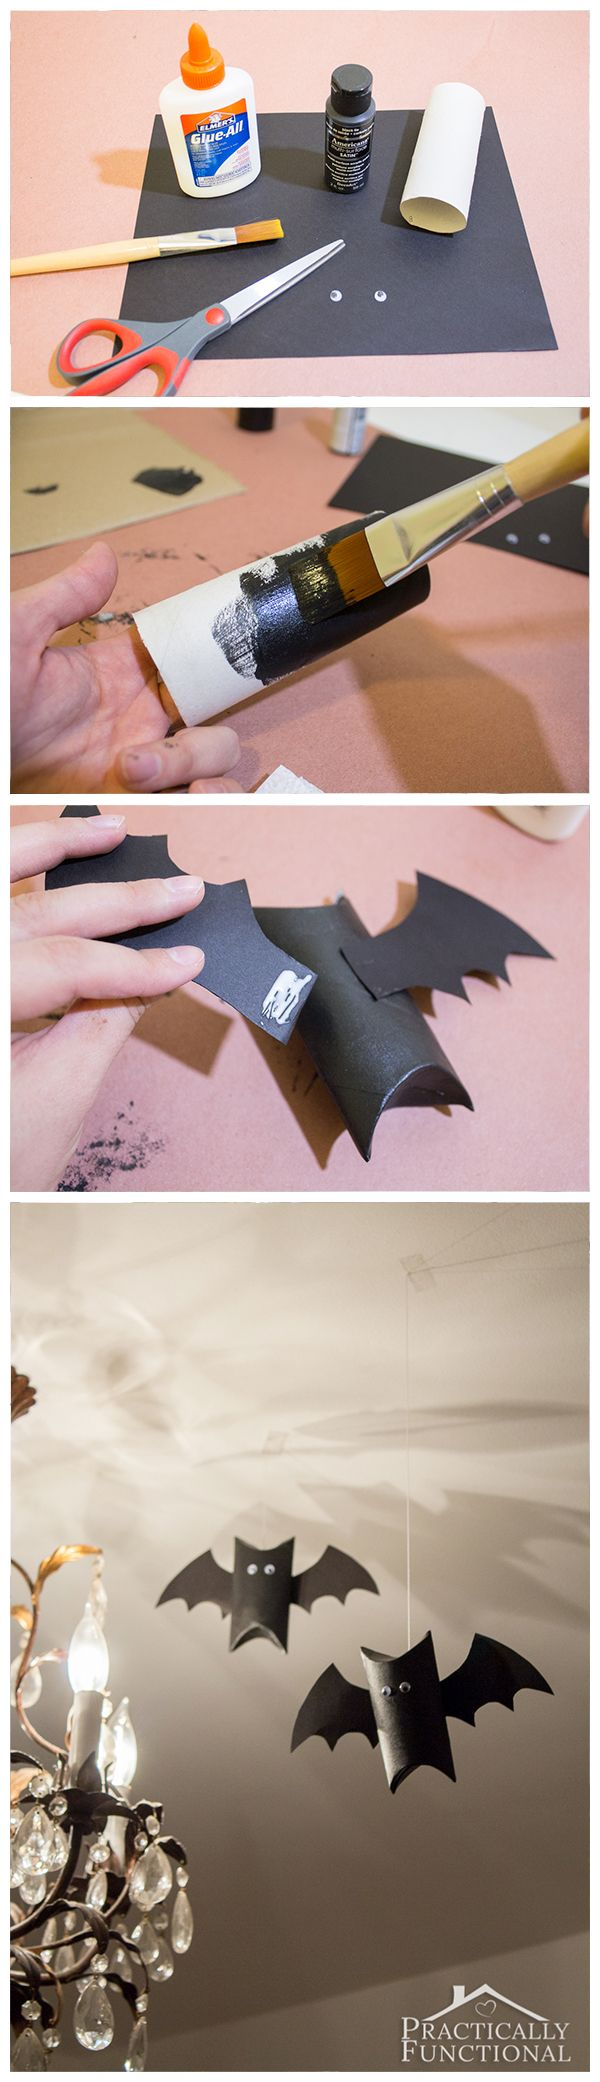 Turn empty cardboard tubes into super cute bat decorations for Halloween!